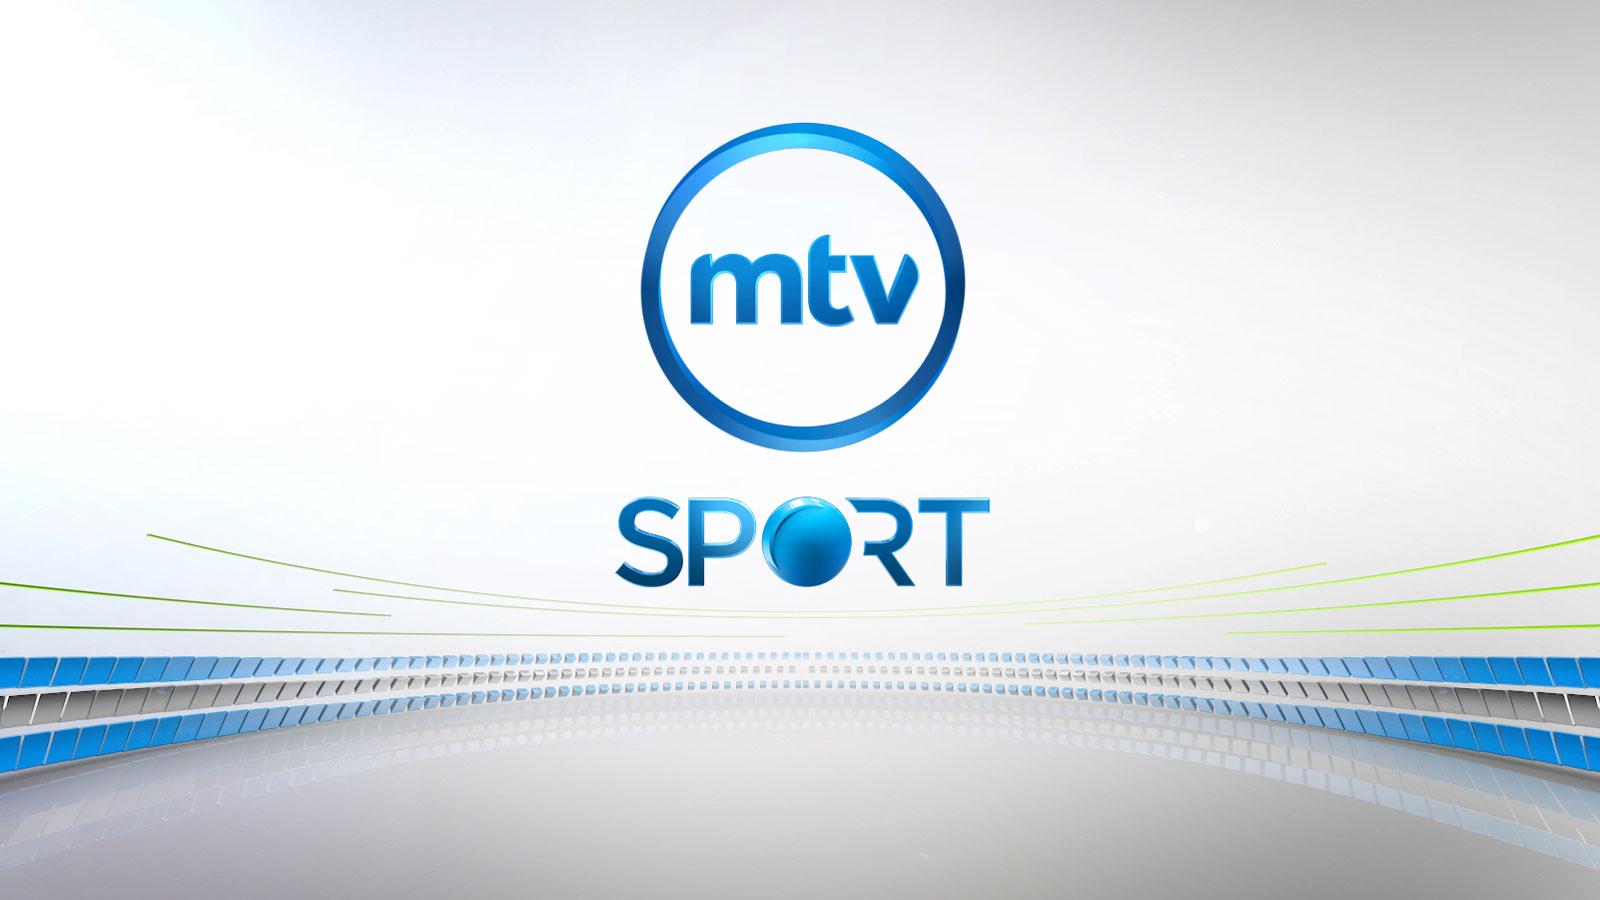 mtv3 sport Laitila